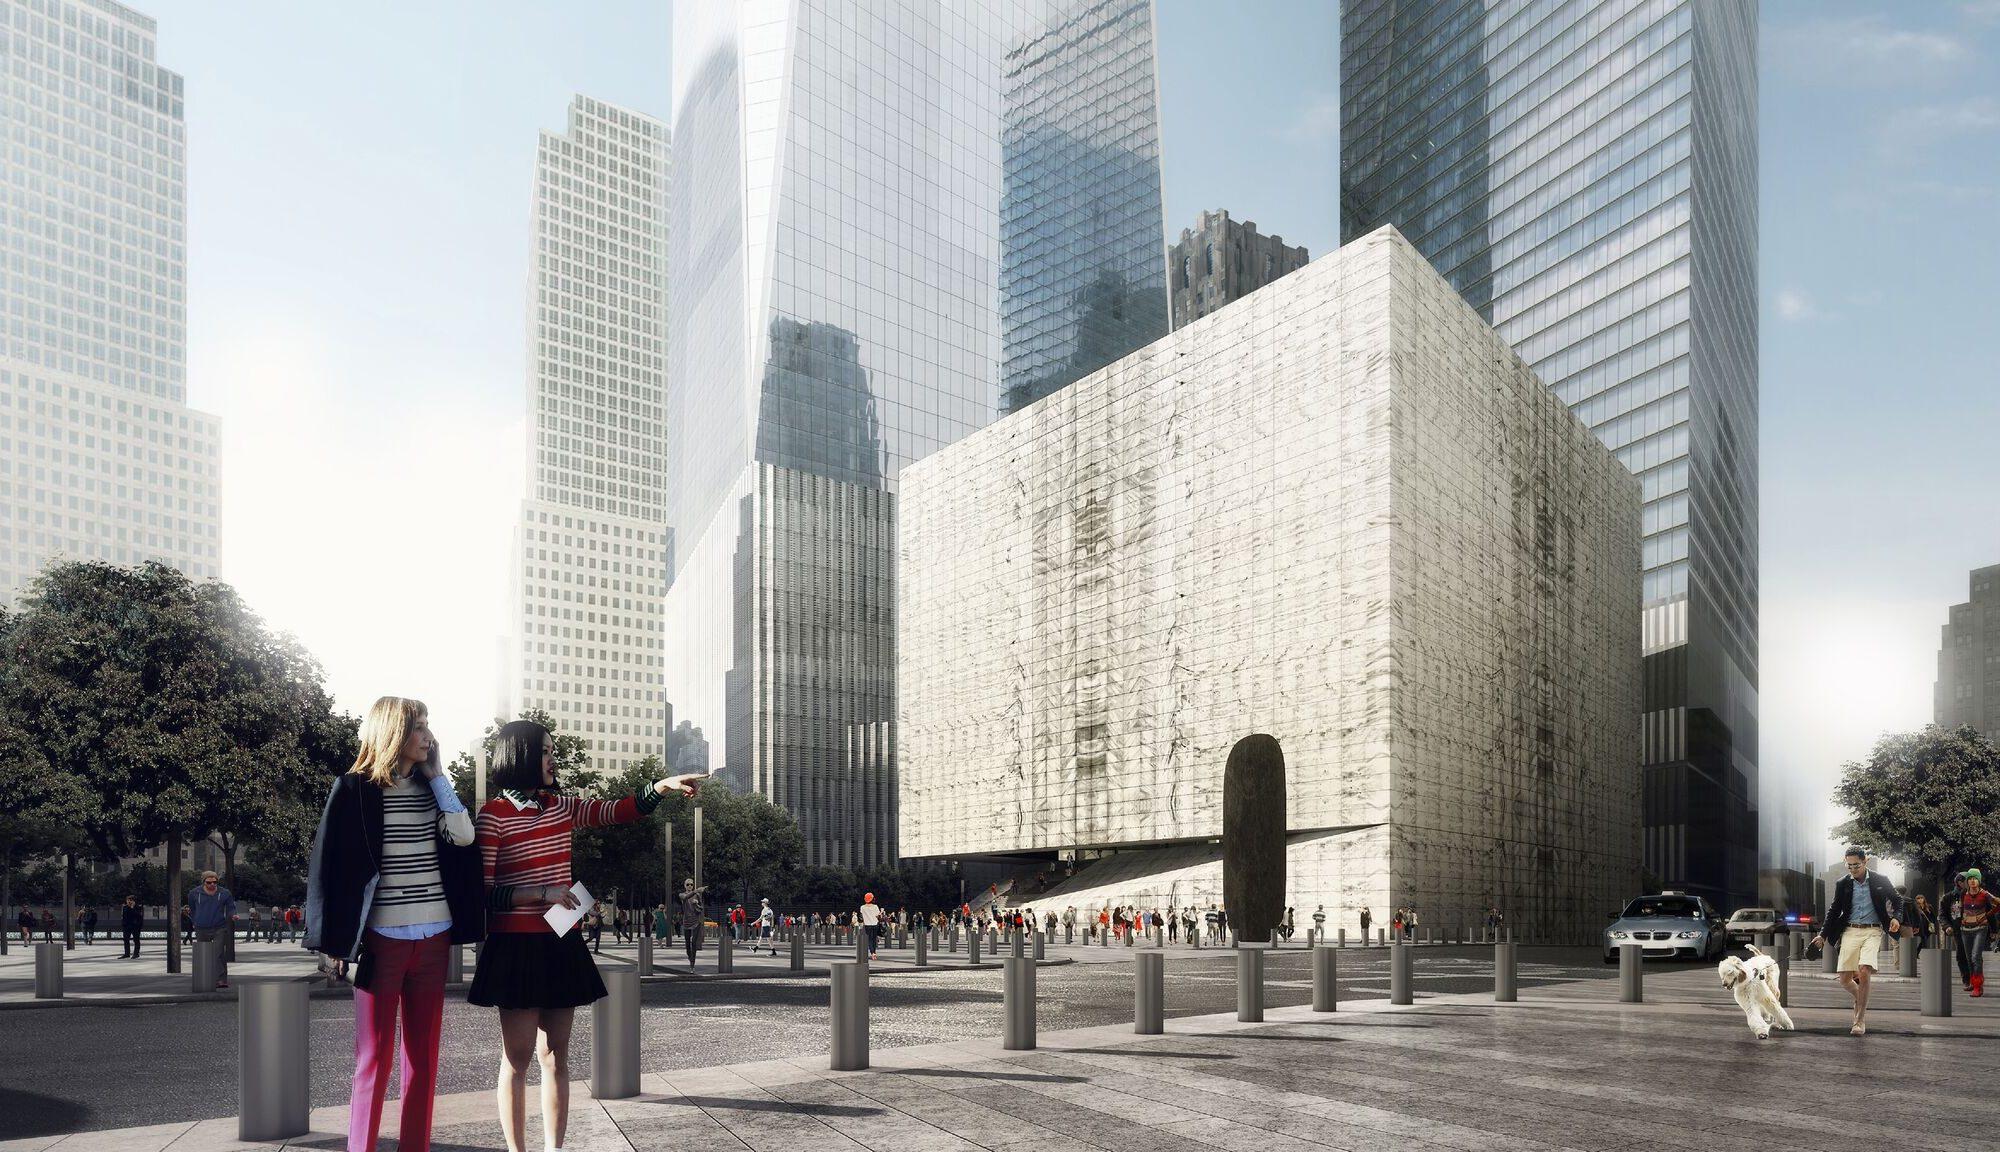 Design for the Ronald O. Perelman Performing Arts Center Unveiled